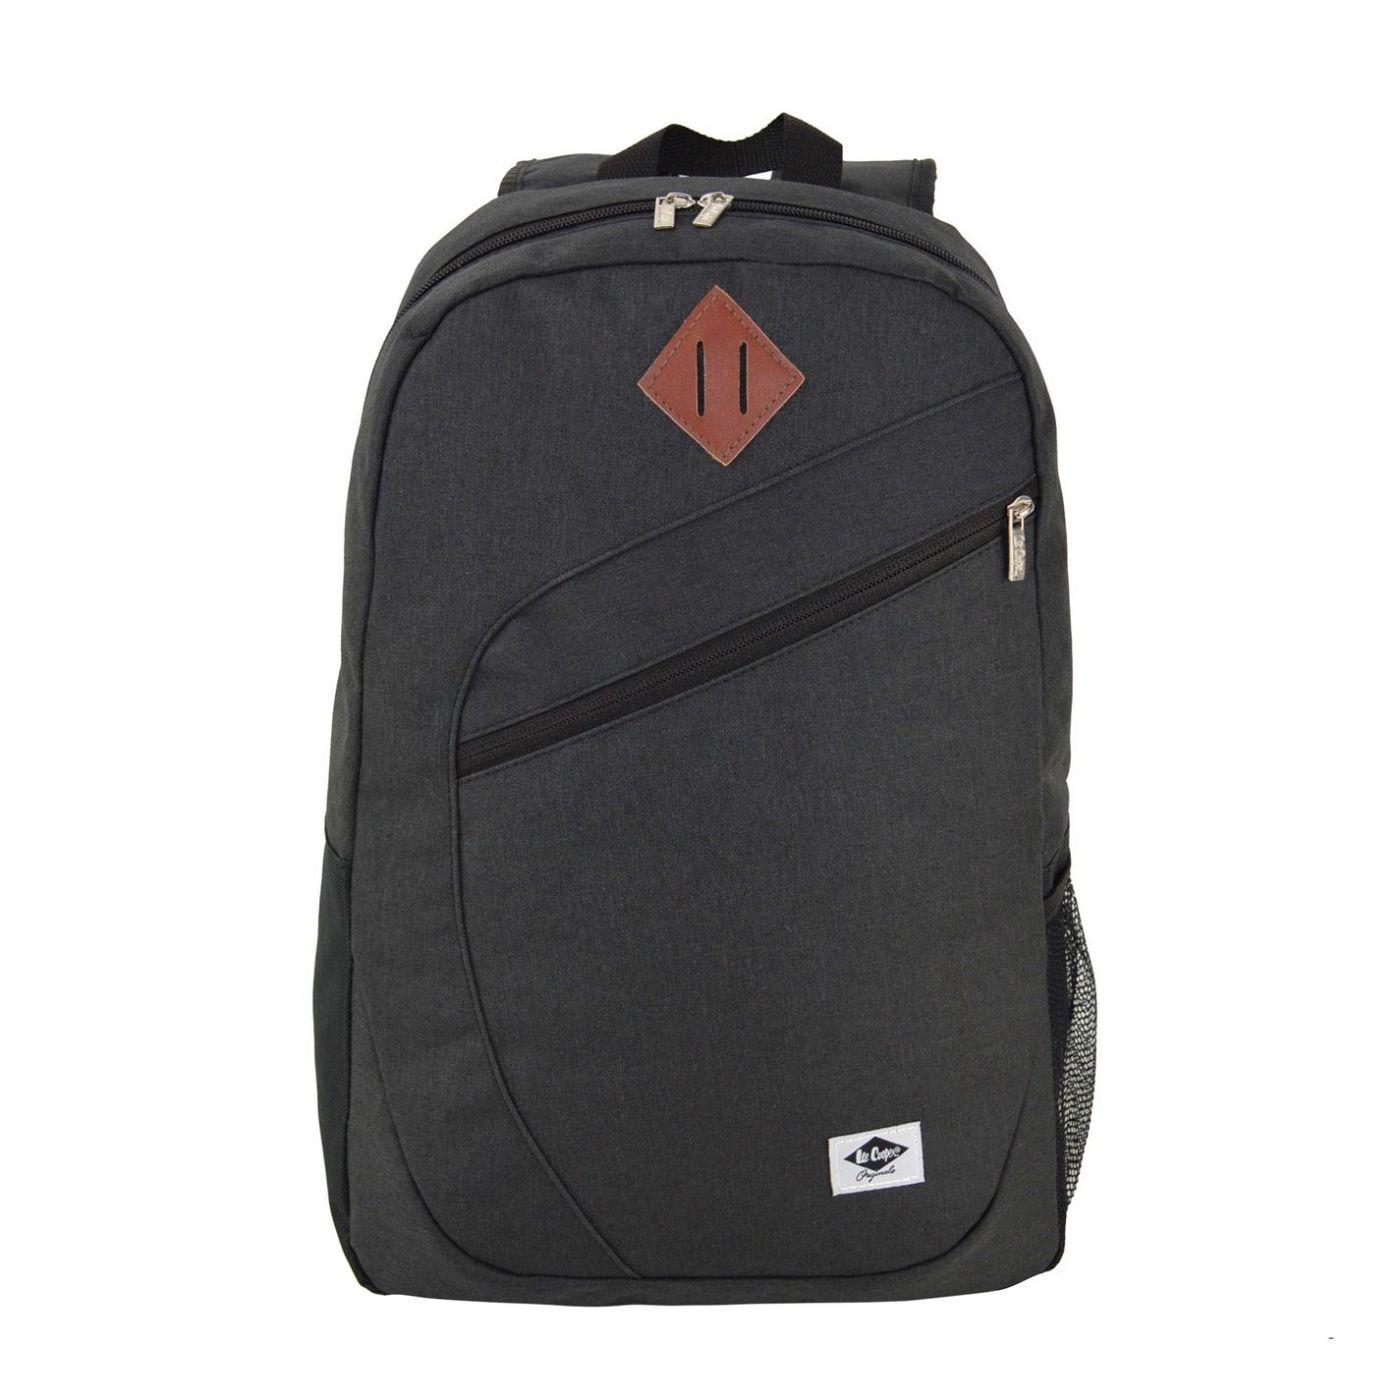 Lee Cooper Marl Backpack